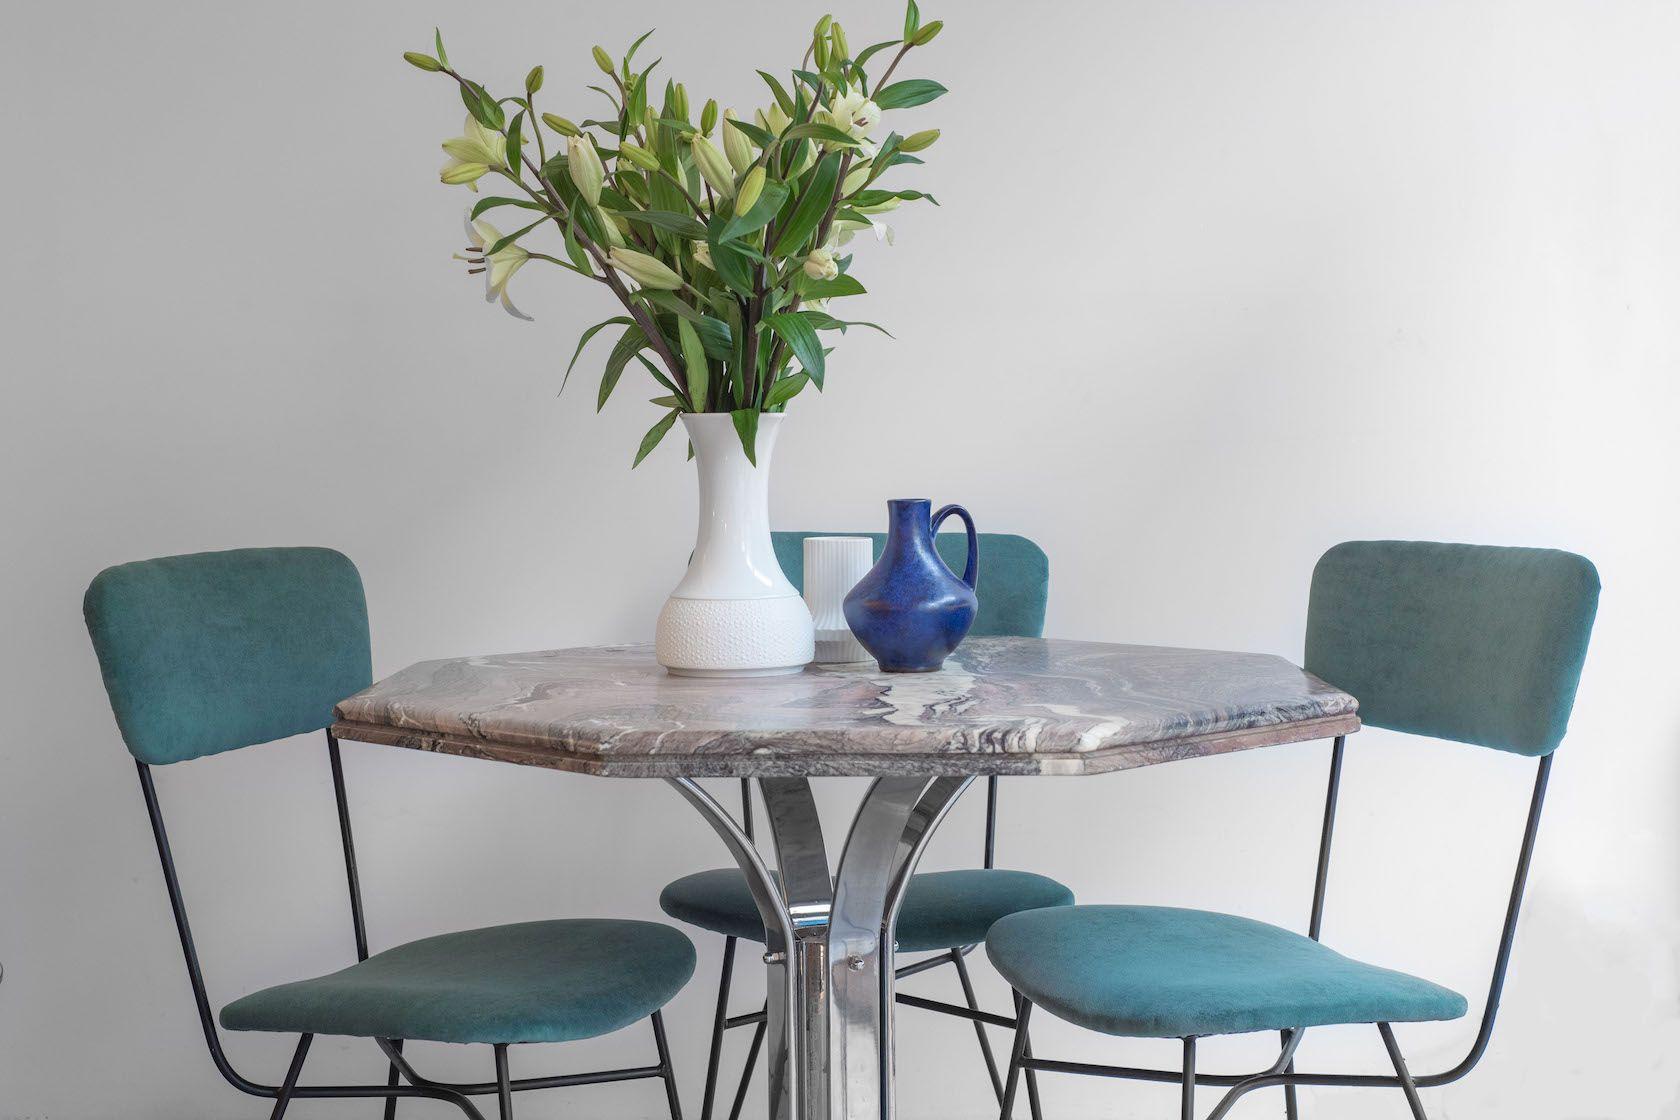 italienische st hle mit gr nem samt 1950er 6er set bei pamono kaufen. Black Bedroom Furniture Sets. Home Design Ideas